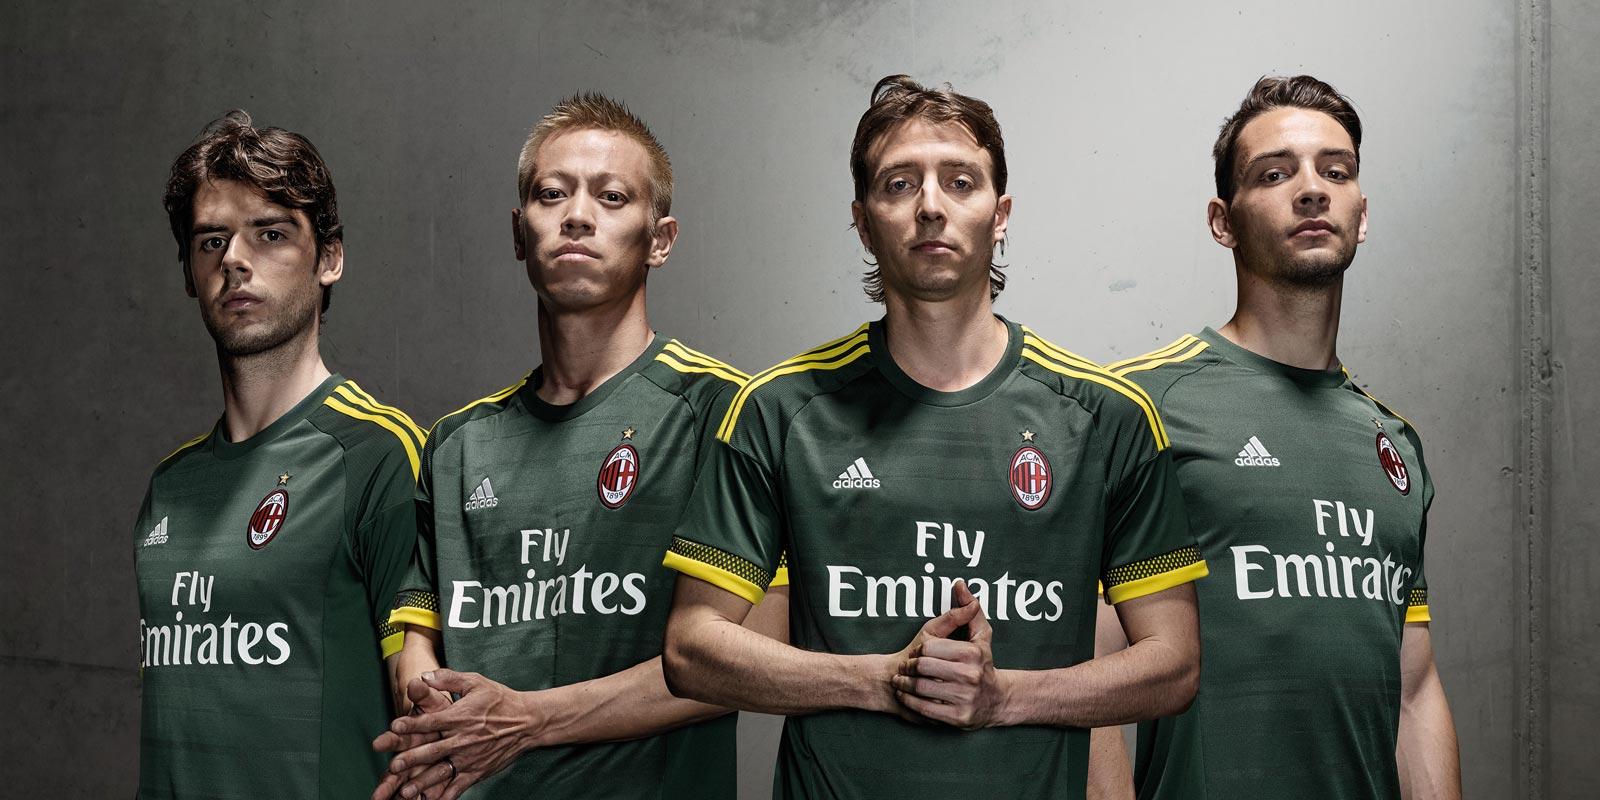 trop restaurant de jordan - AC Milan 15-16 Kits Revealed - Footy Headlines